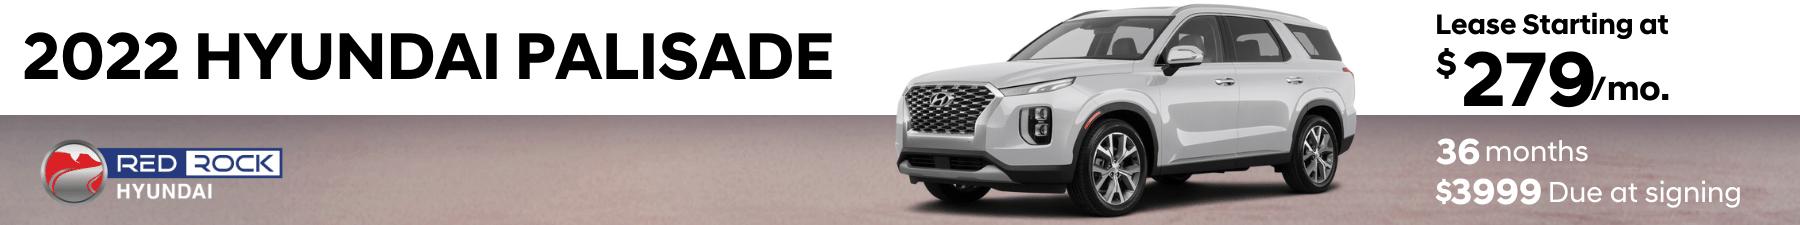 Red Rock Hyundai Sept 2021 Slides